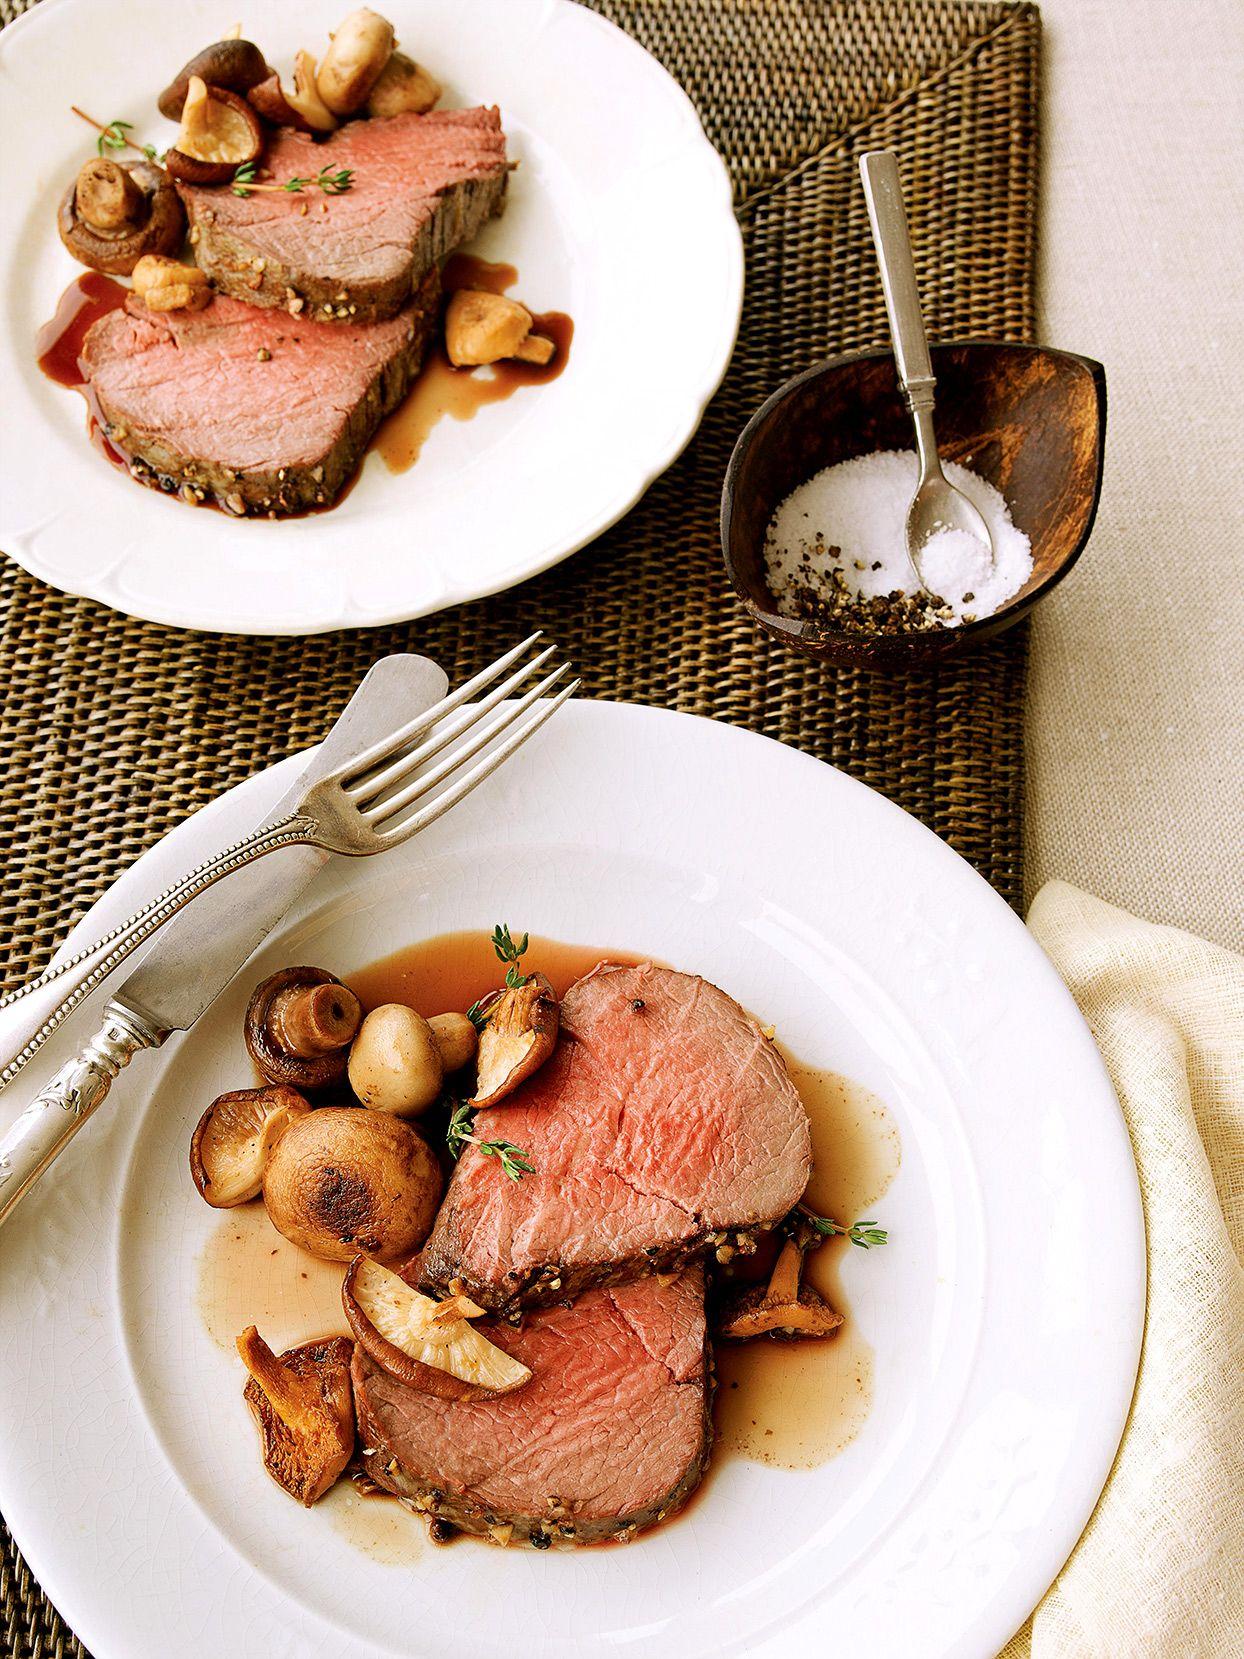 Slow Roasted Beef Tenderloin Recipe Roast Beef Recipes Beef Recipes Roast Beef Dinner